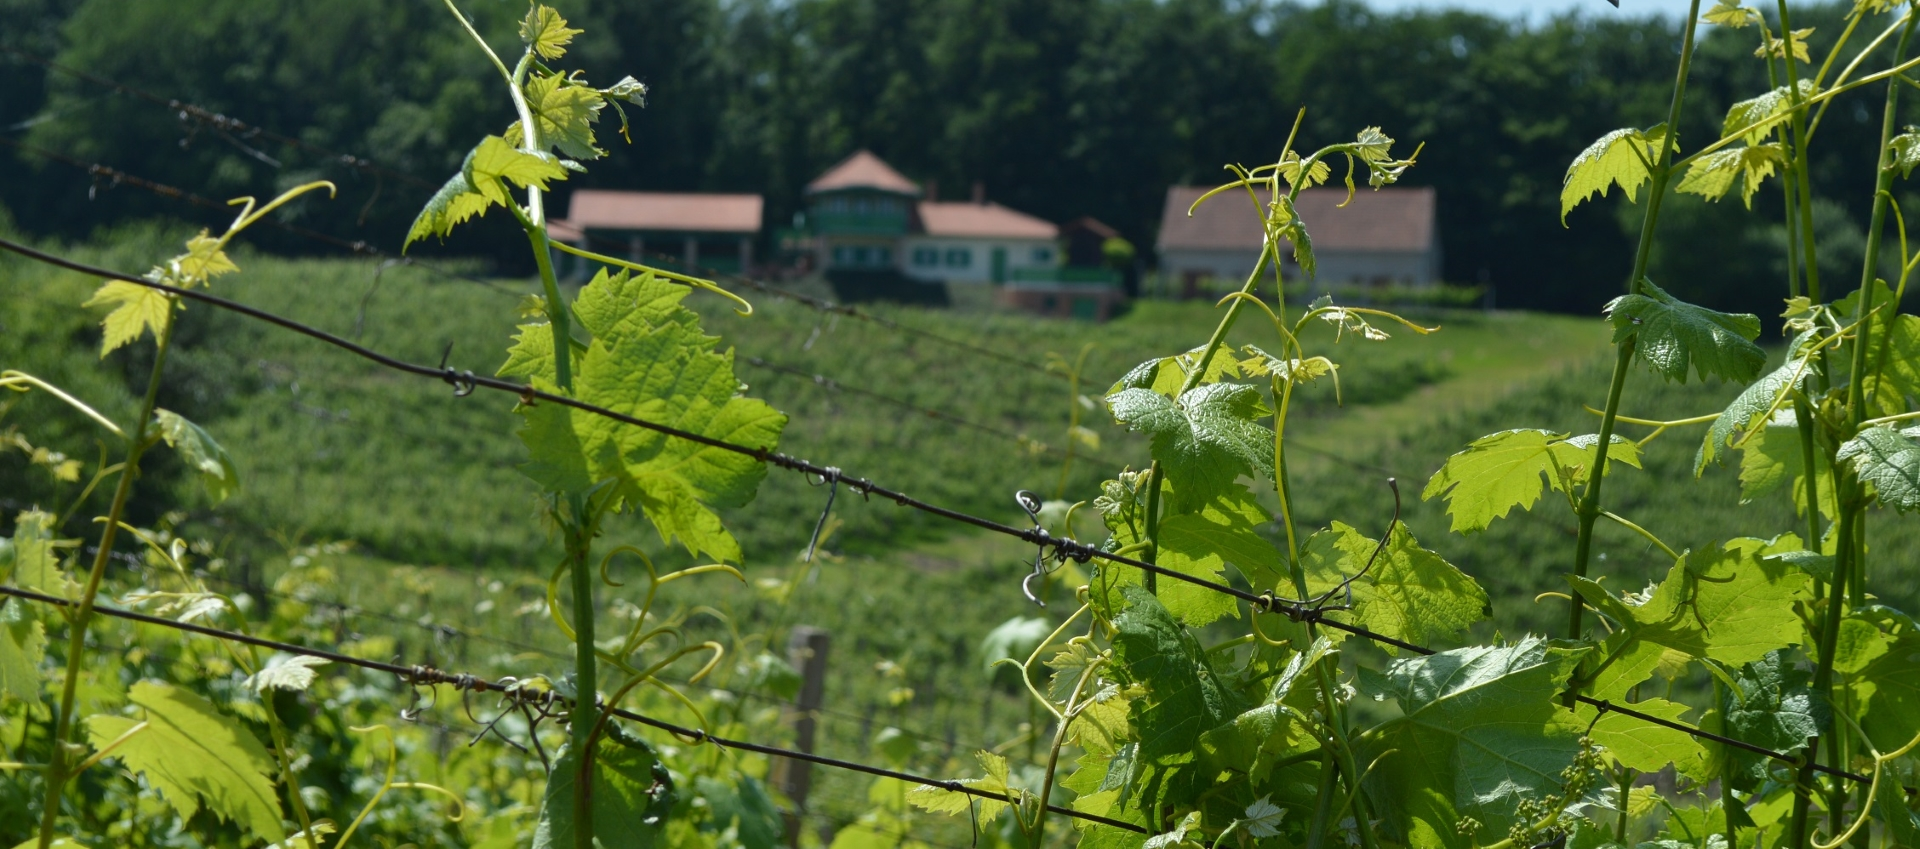 Odmor i zabava na 'Feričanačkoj berbi grožđa'